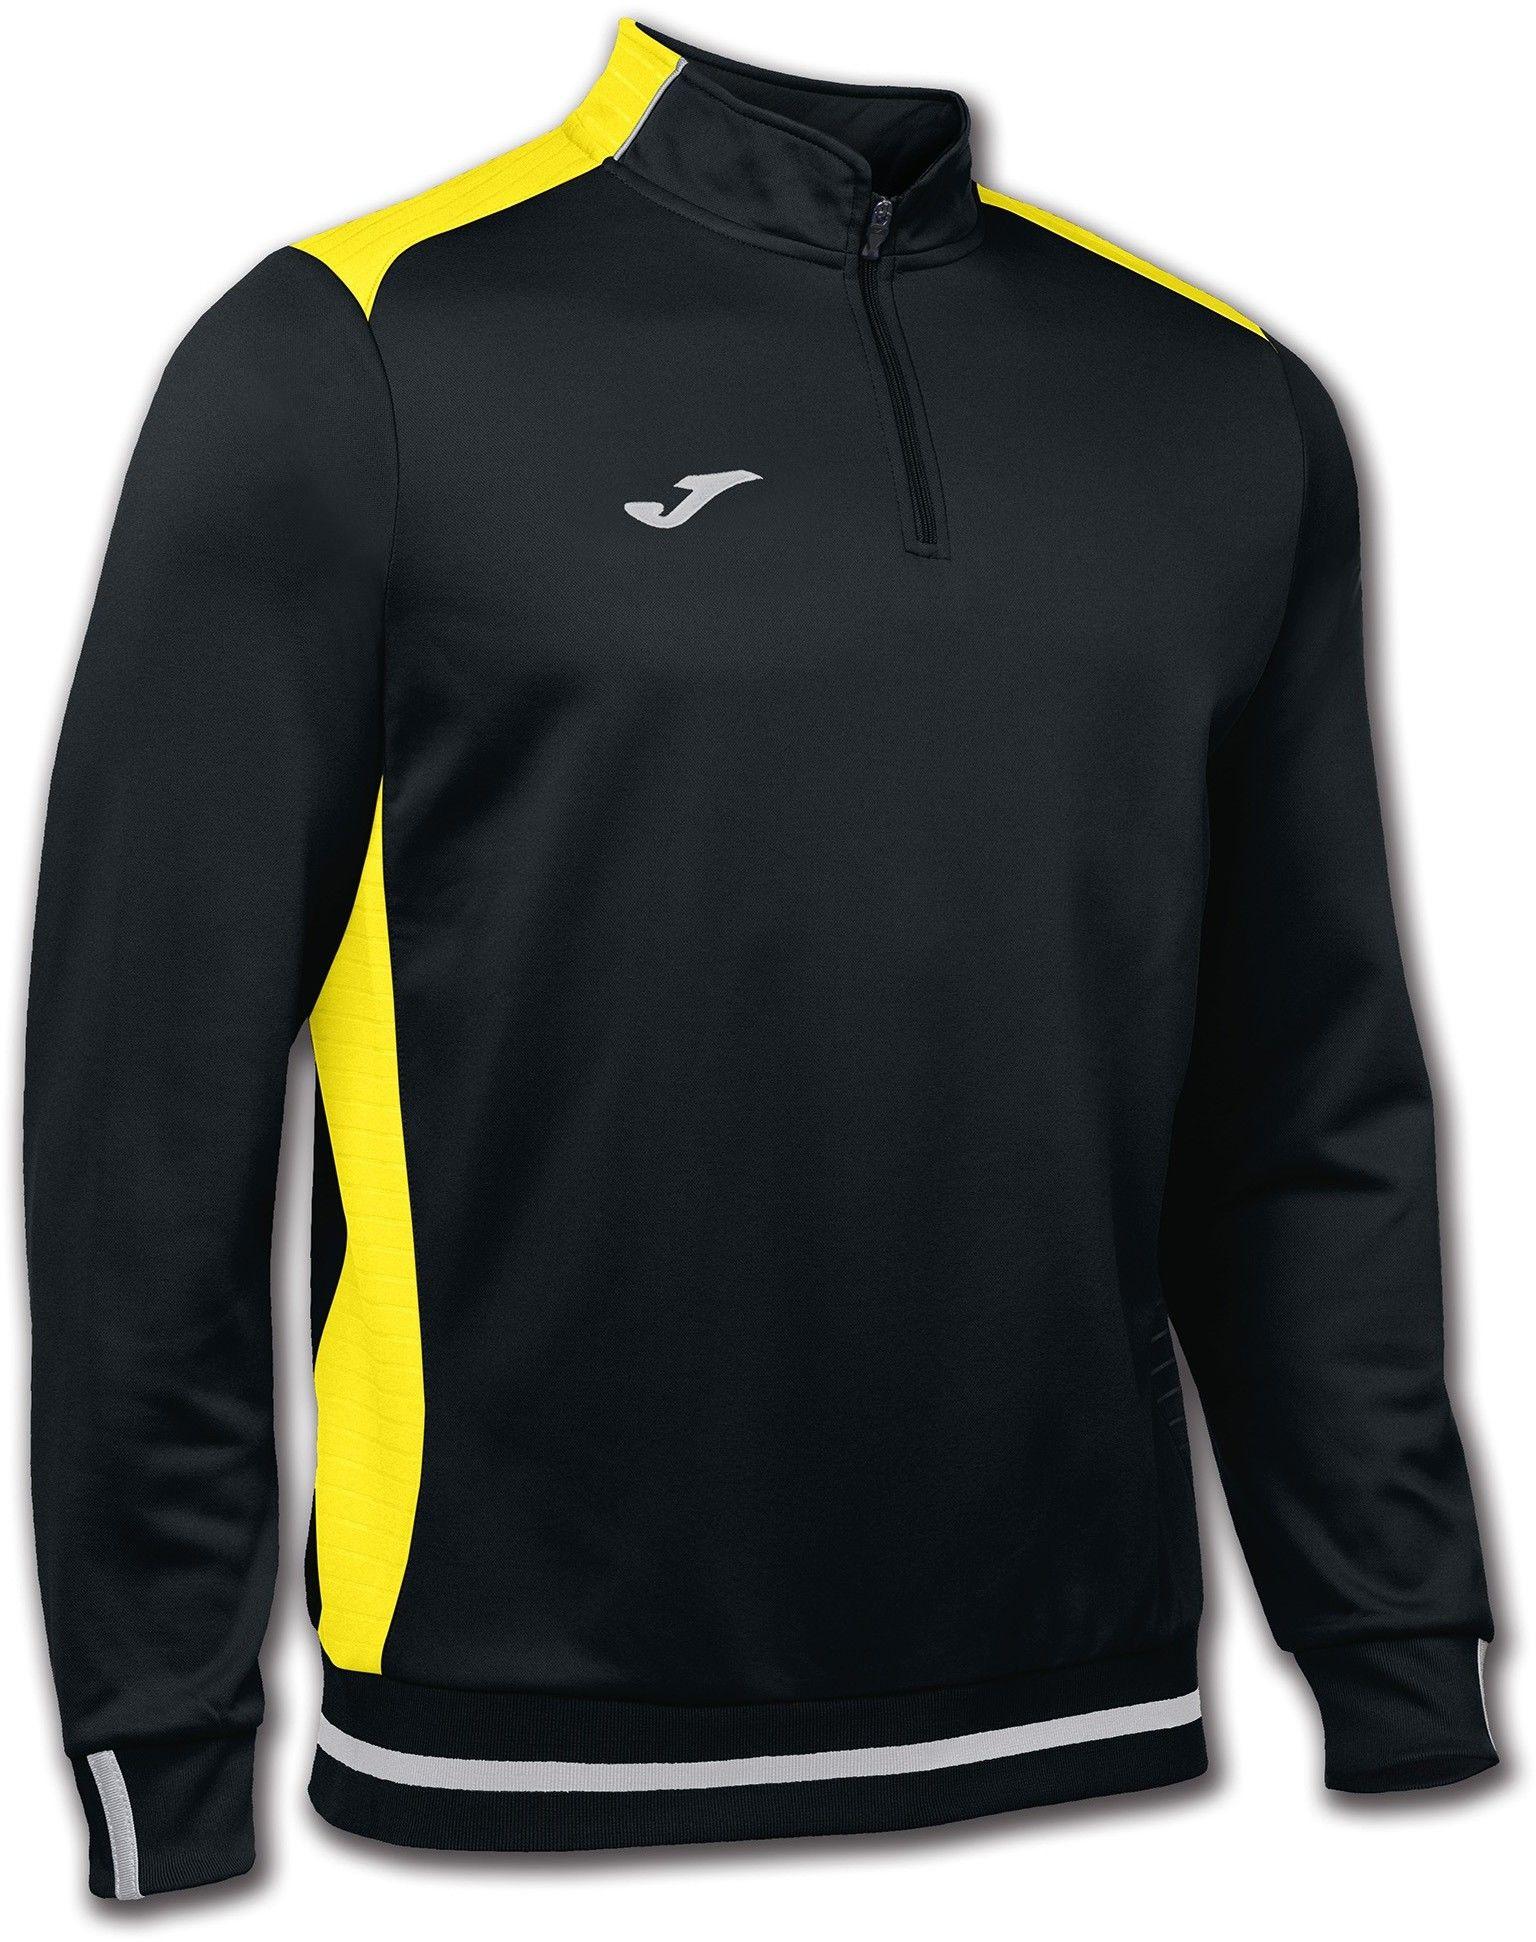 Bluza Joma Campus II black/yellow (10 szt.)